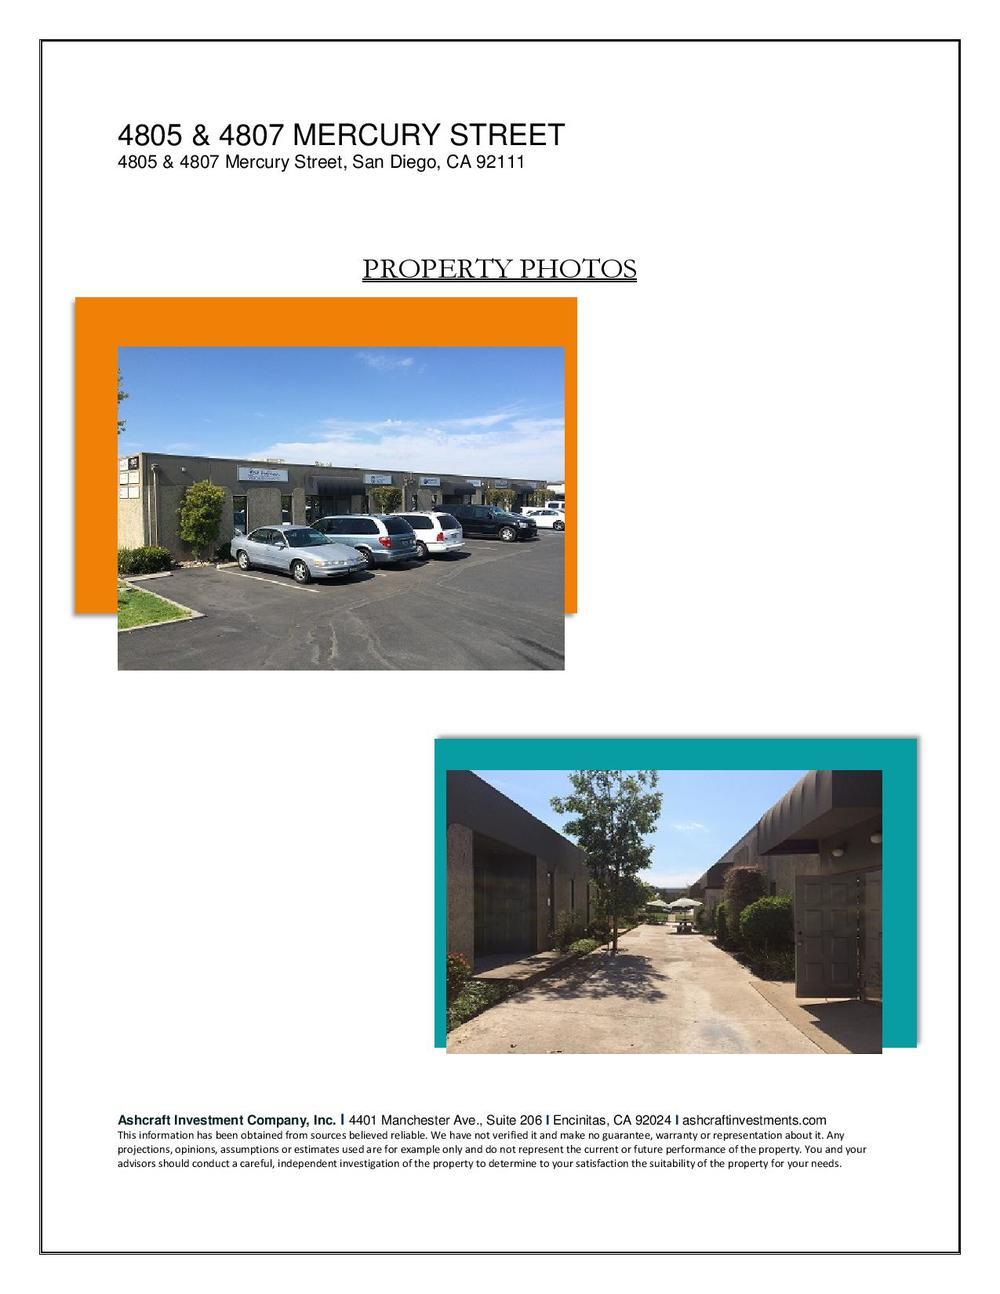 MER Marketing Flyer-page-003 (1).jpg